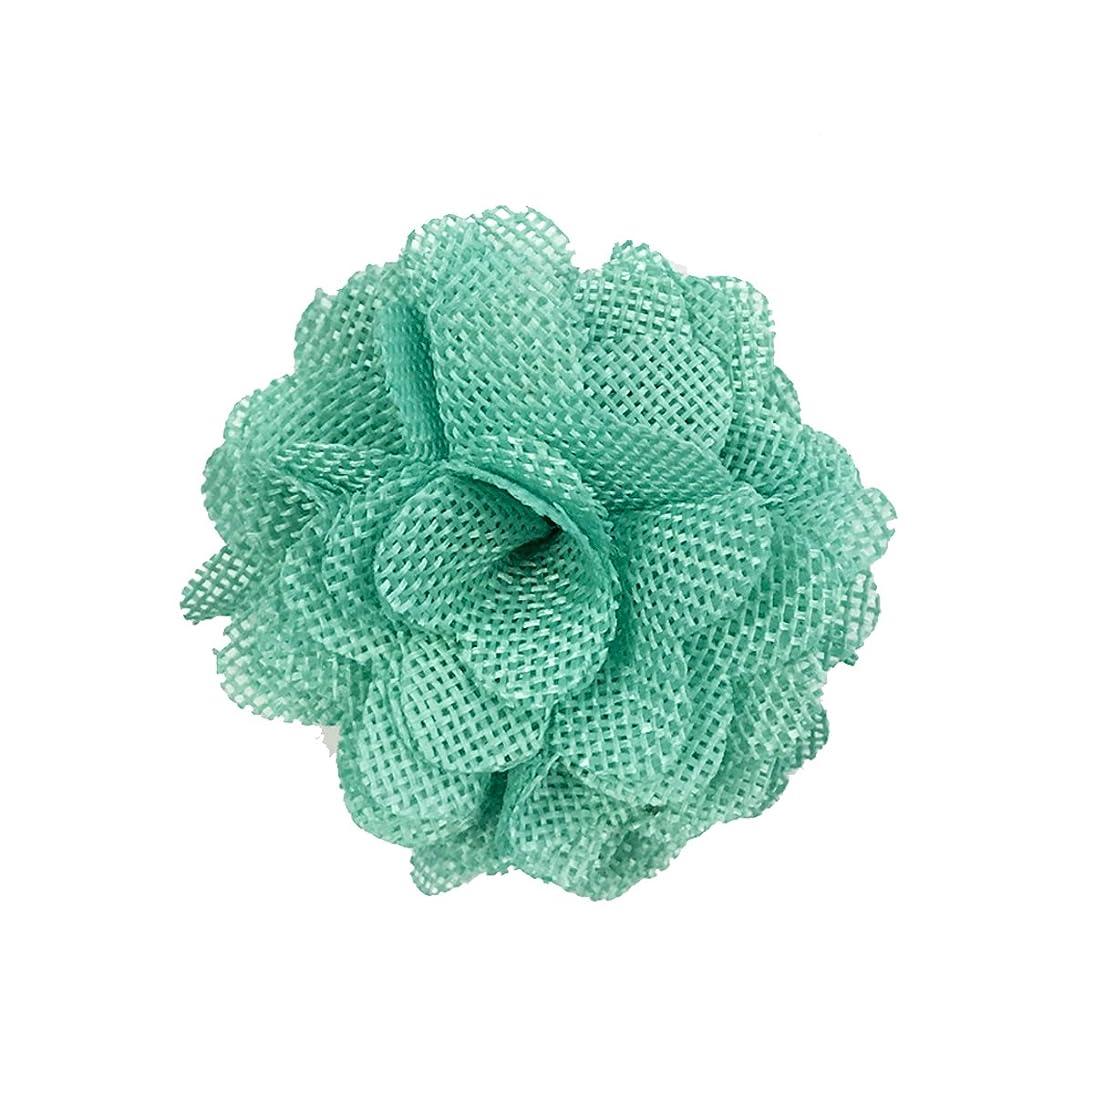 Allydrew Burlap Flower Embellishment Burlap Roses for Weddings (12pcs), Mint